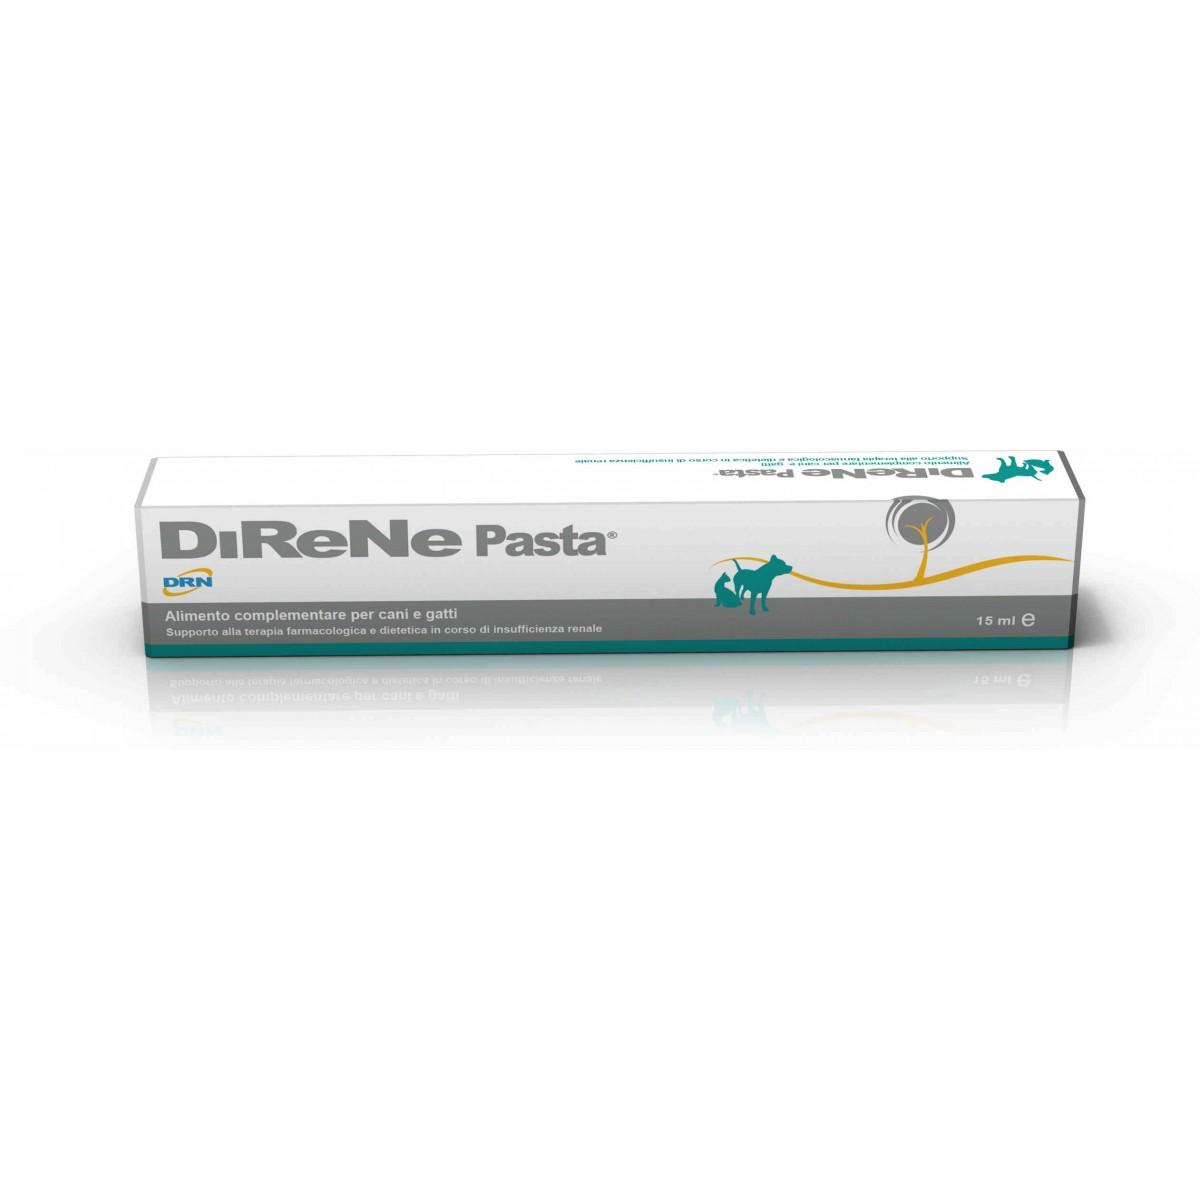 Direne Pasta, DRN,15ml imagine